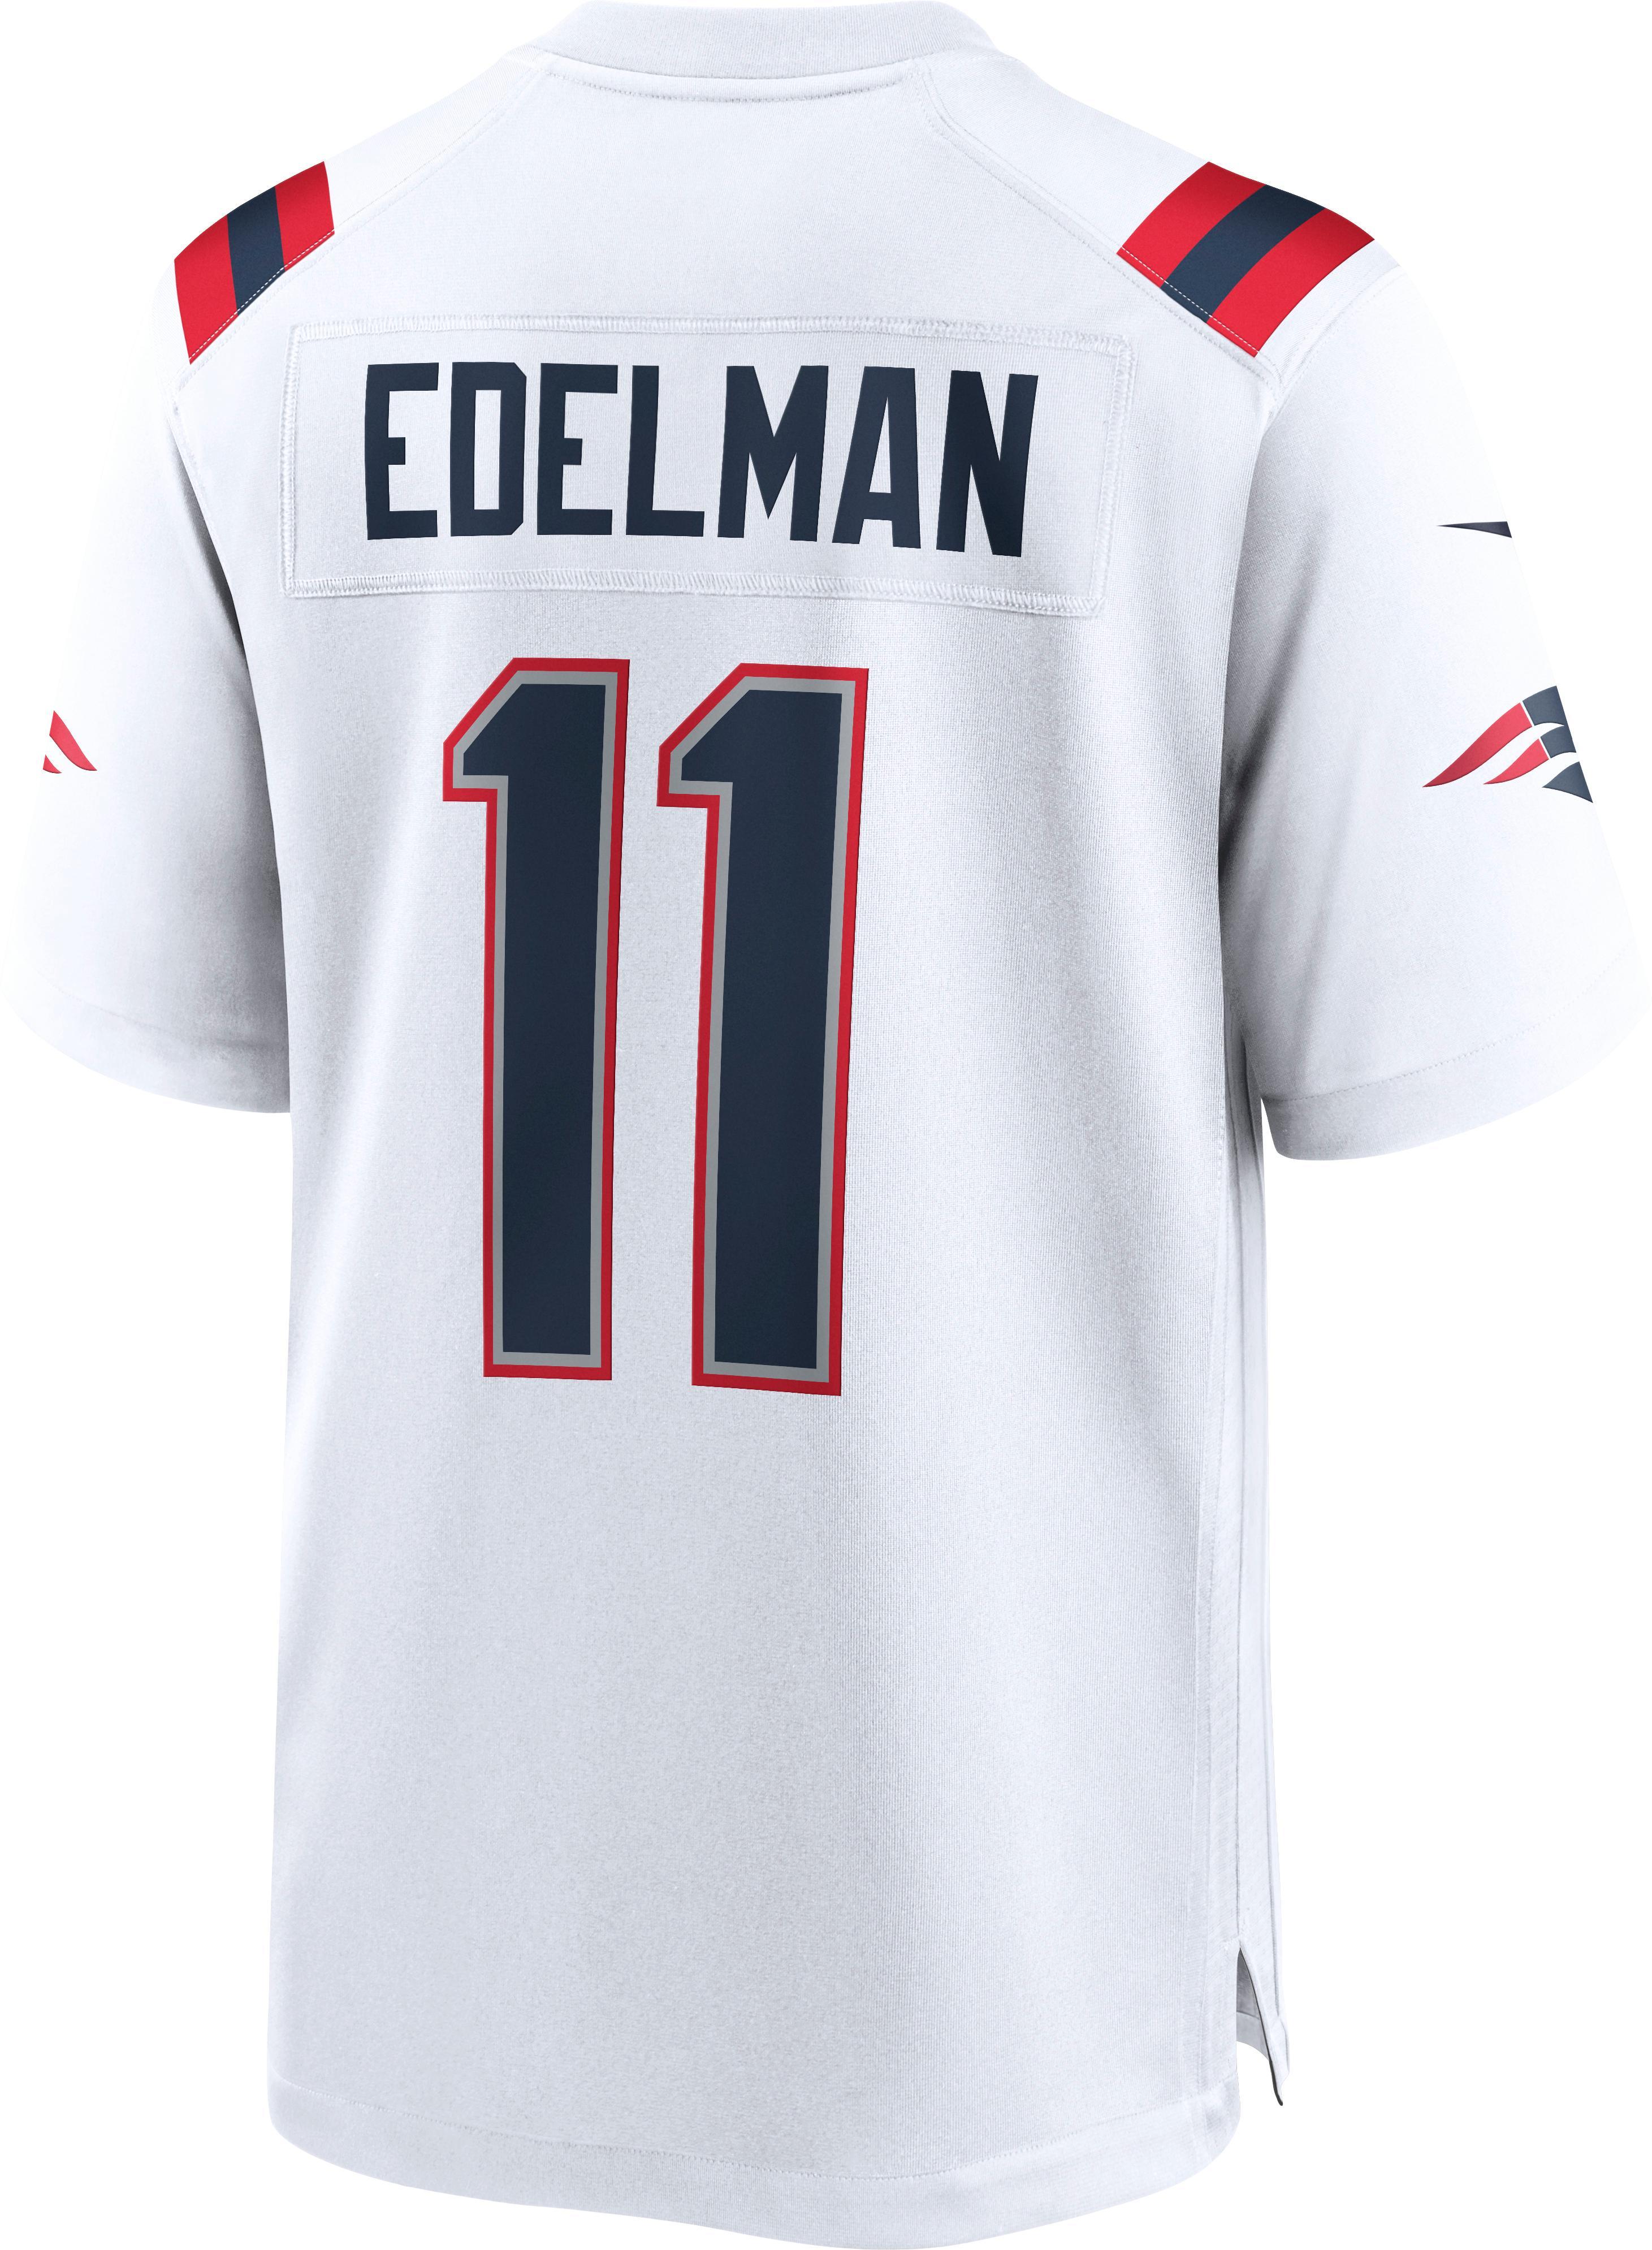 Rot WEVB New England Patriots im Freien Julian Edelman Julian #11 Herren Rugby-Trikot New England Patriots Jugend American Football Sporttrikot